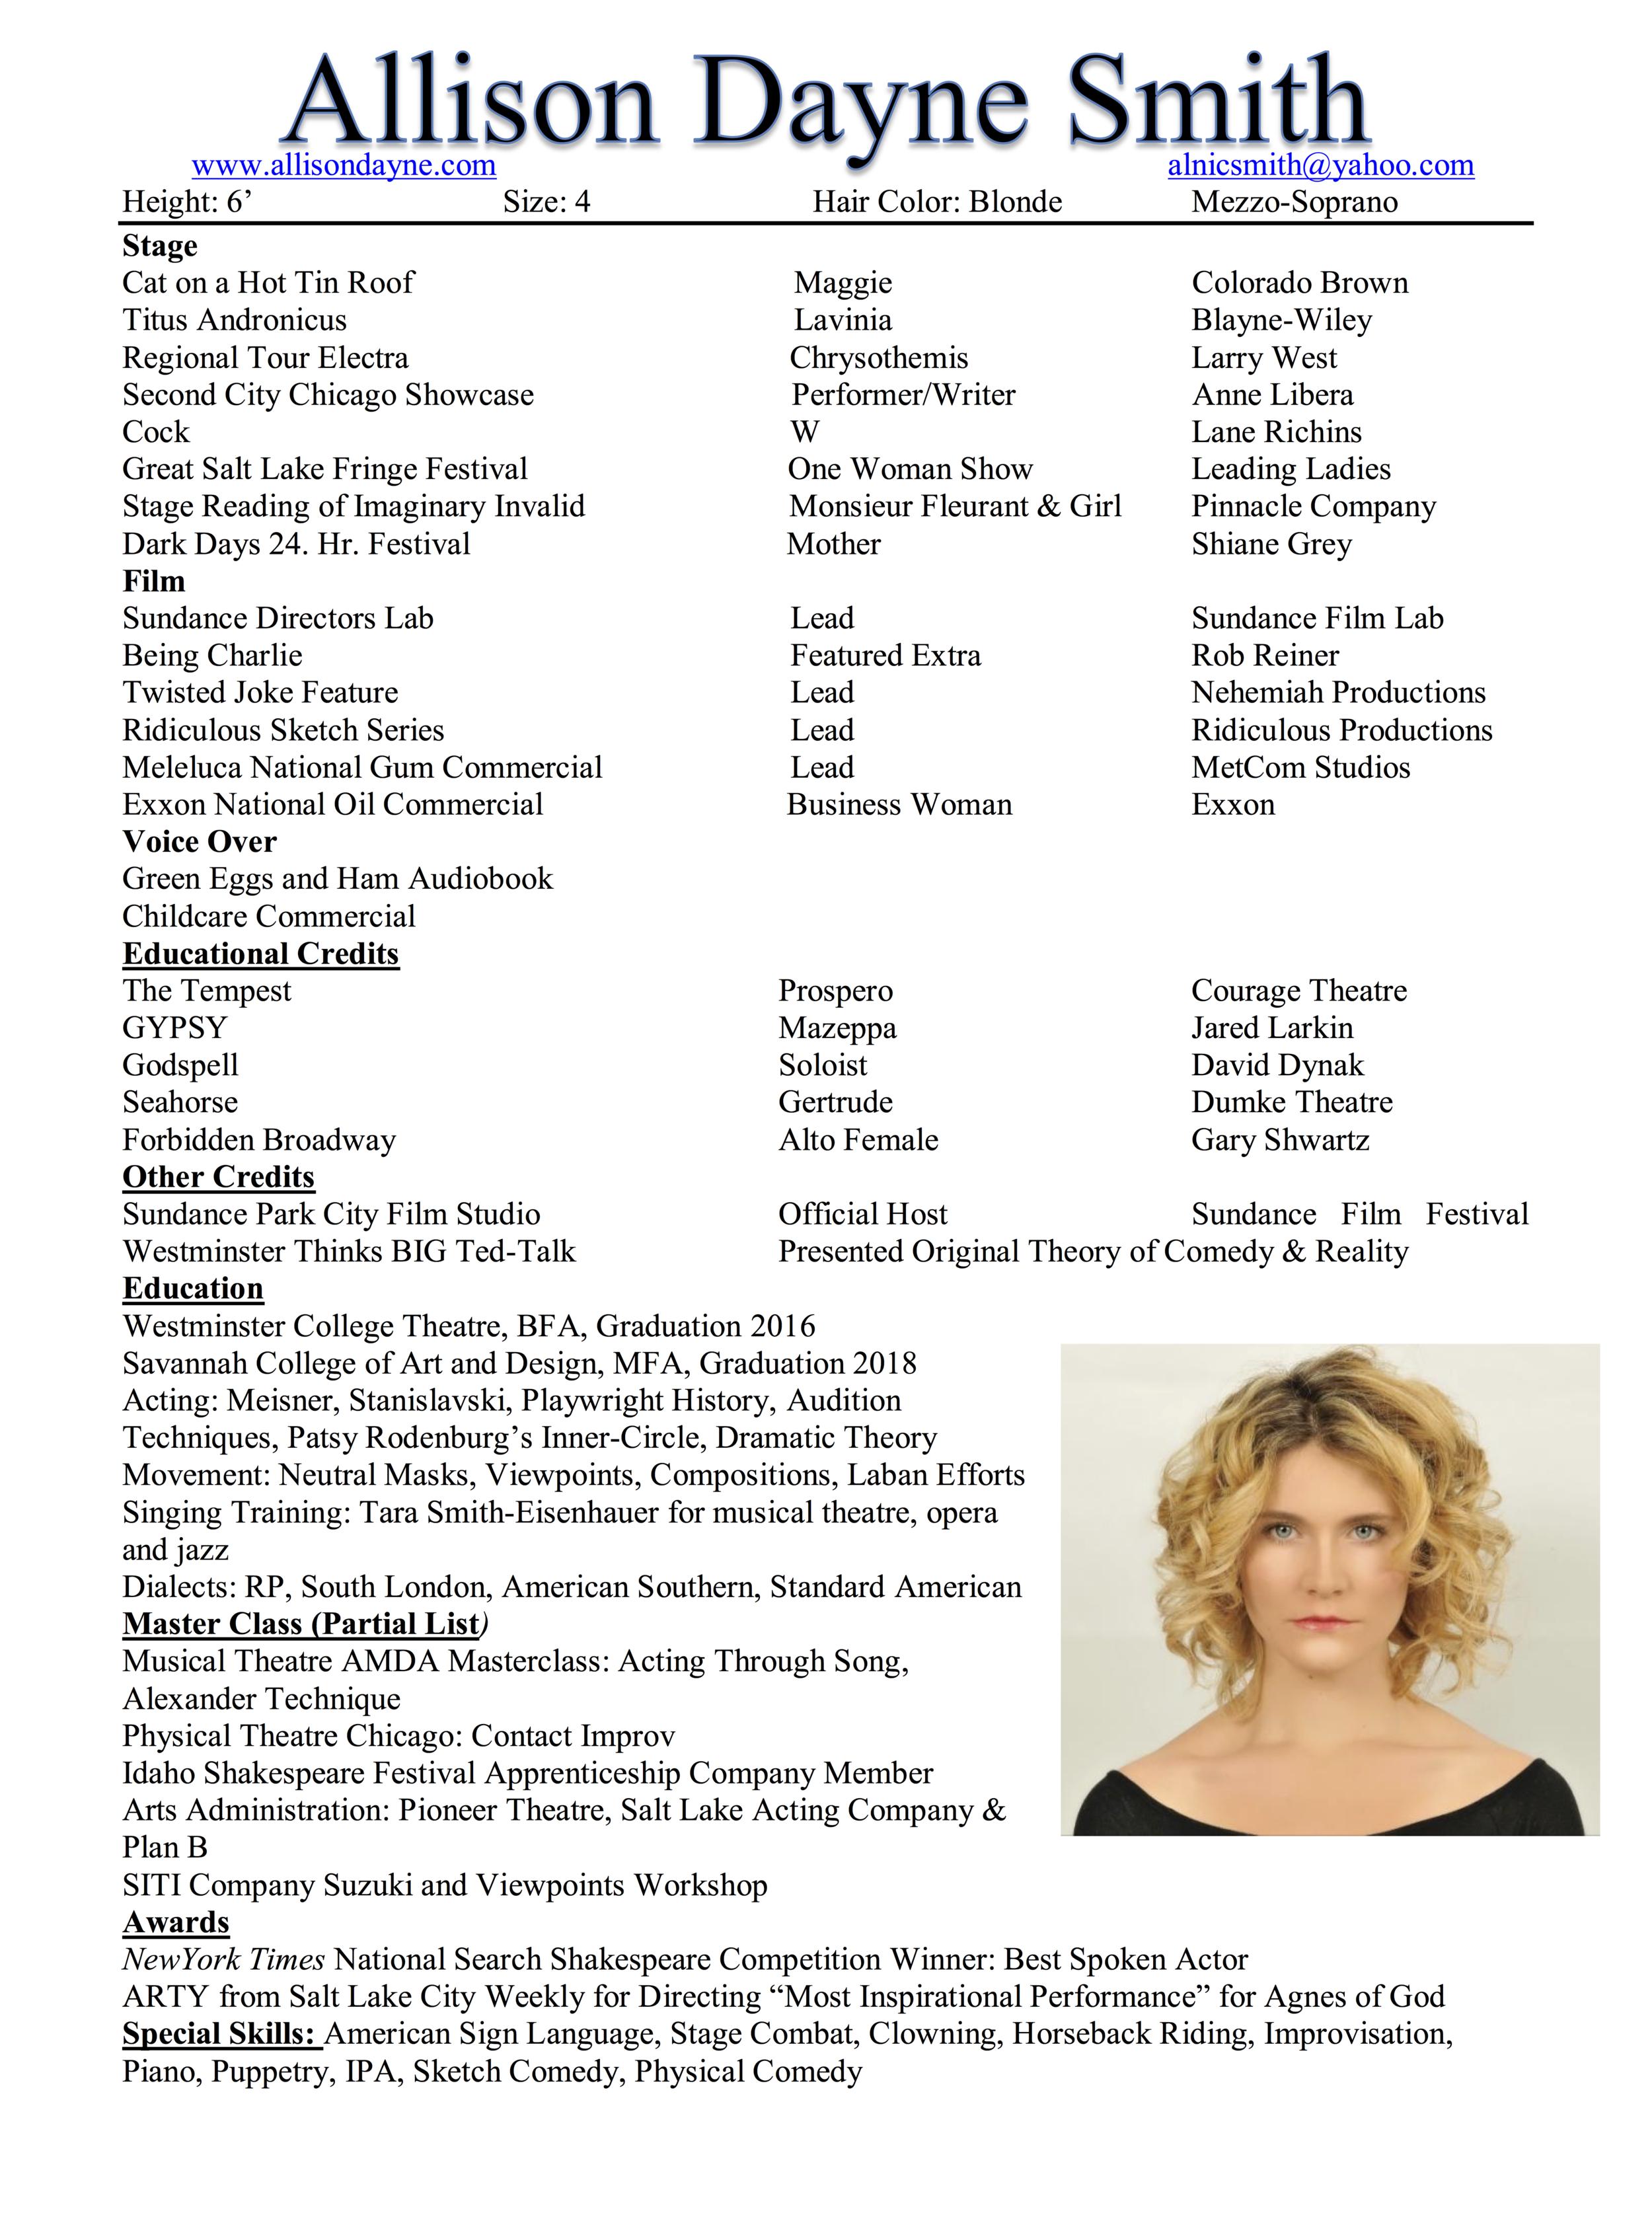 Allison-Dayne-Theater-Resume.png